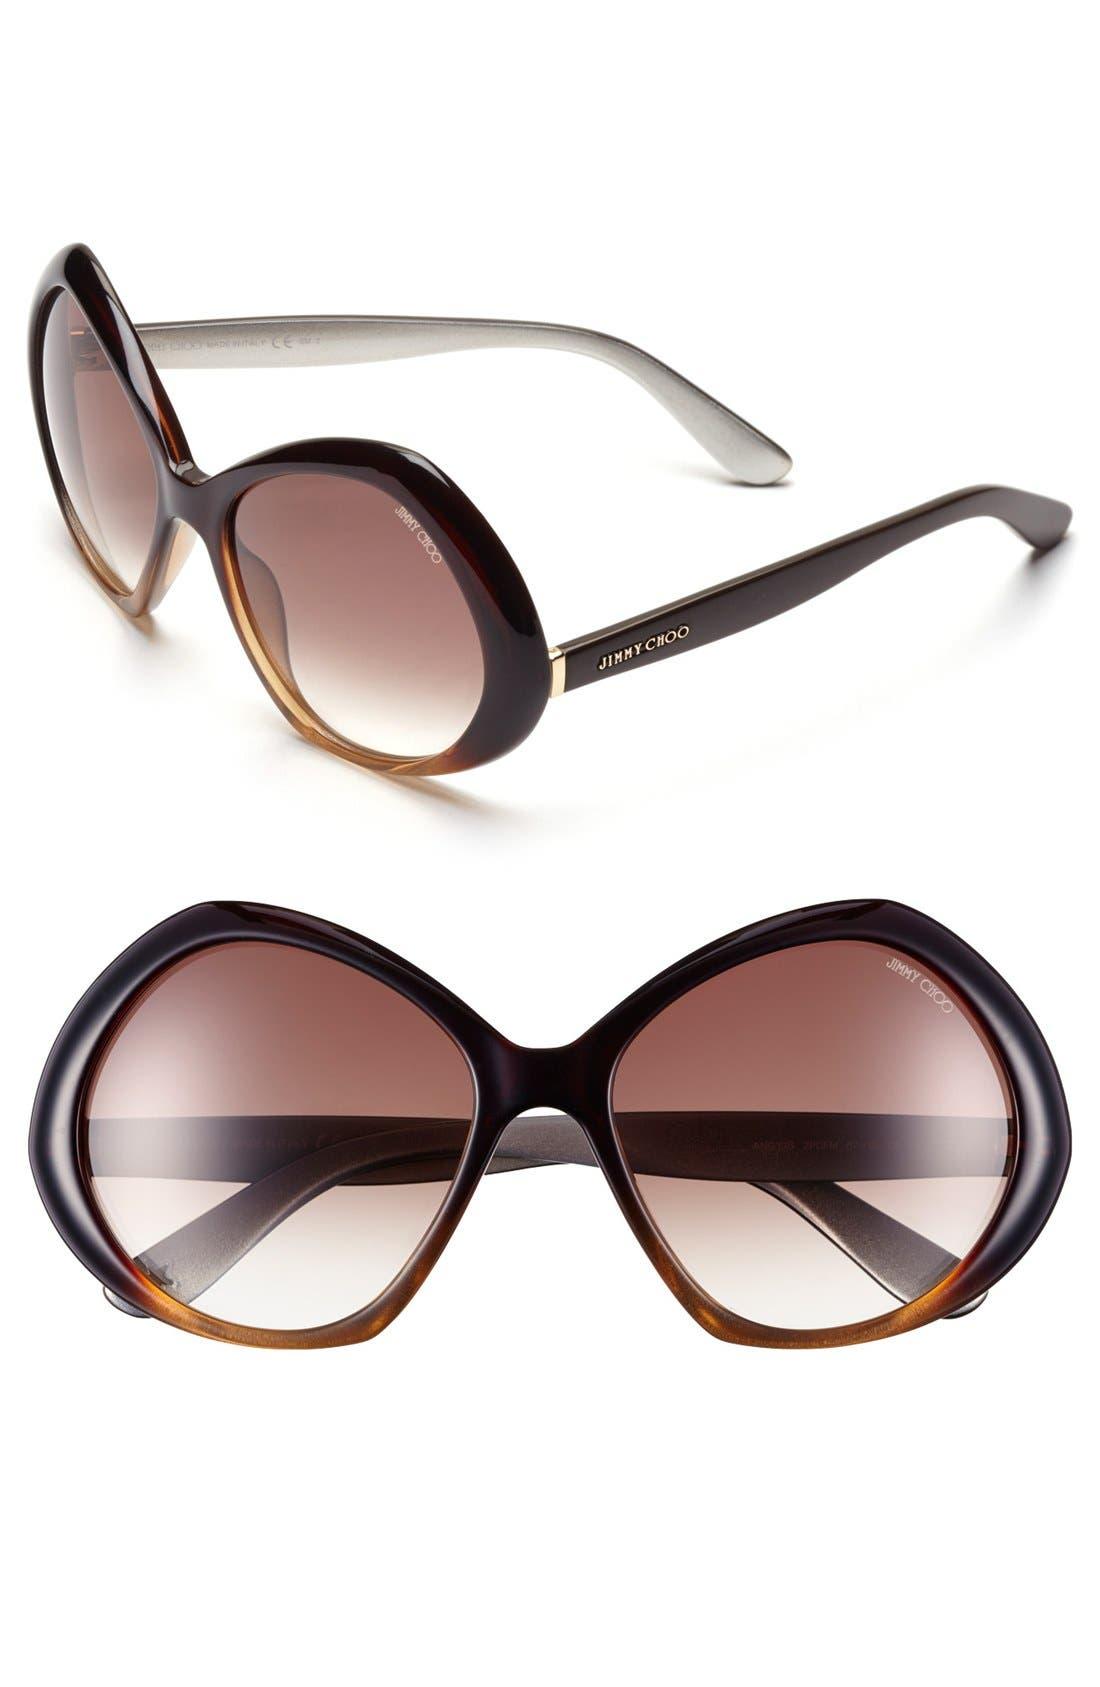 Alternate Image 1 Selected - Jimmy Choo 57mm Oversized Sunglasses